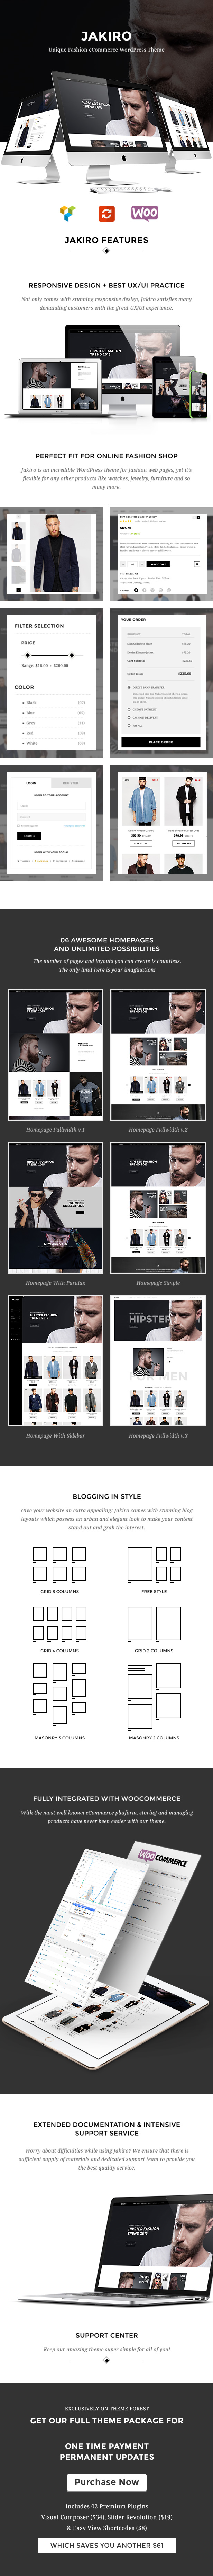 Jakiro - Einzigartiger Modeshop WordPress Layout